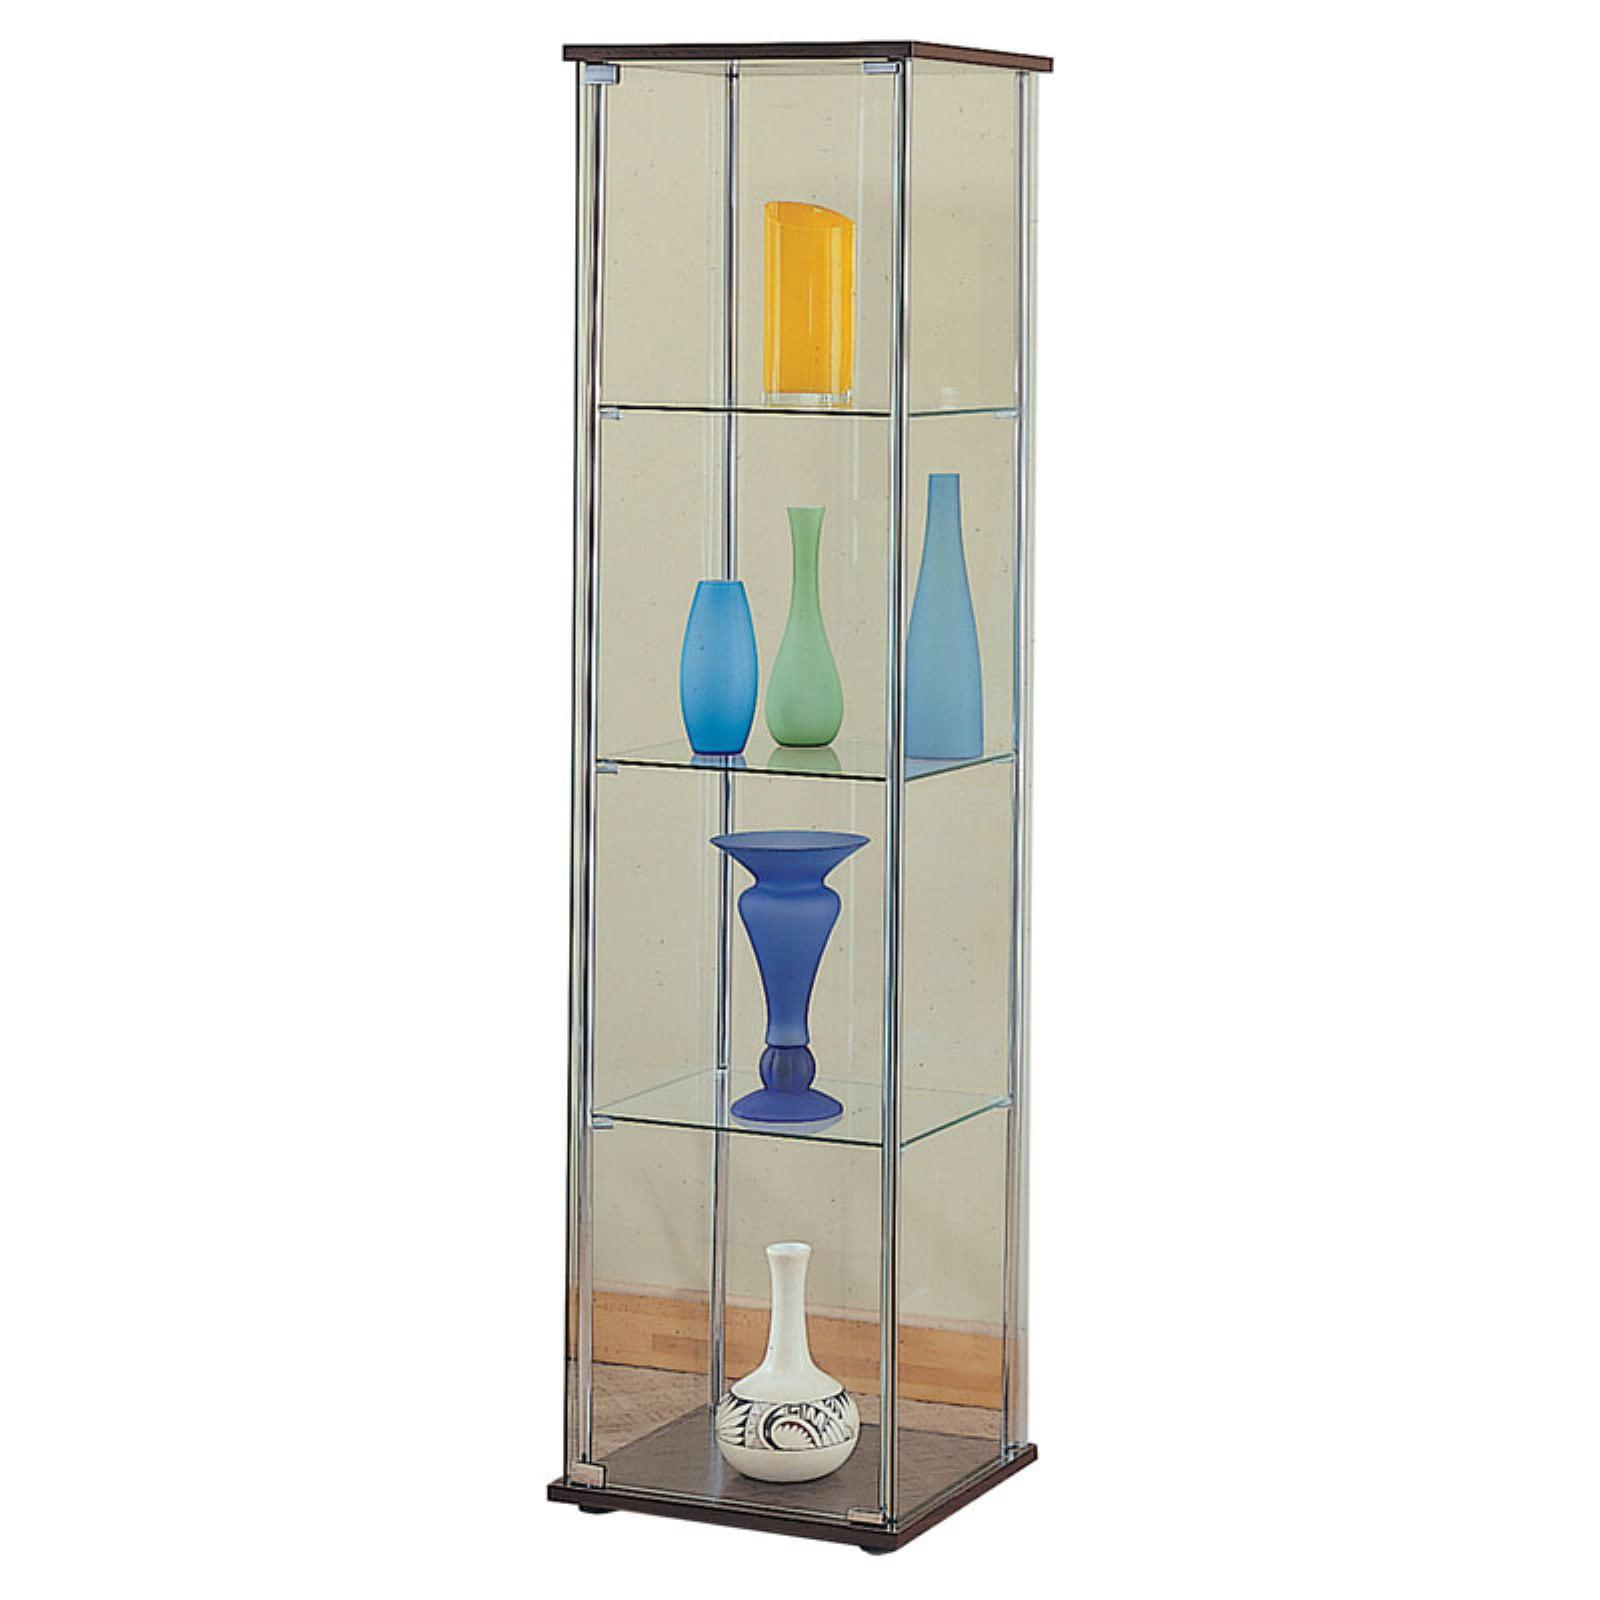 Coaster Company Curio Cabinet, Chrome Cappuccino by Coaster Company